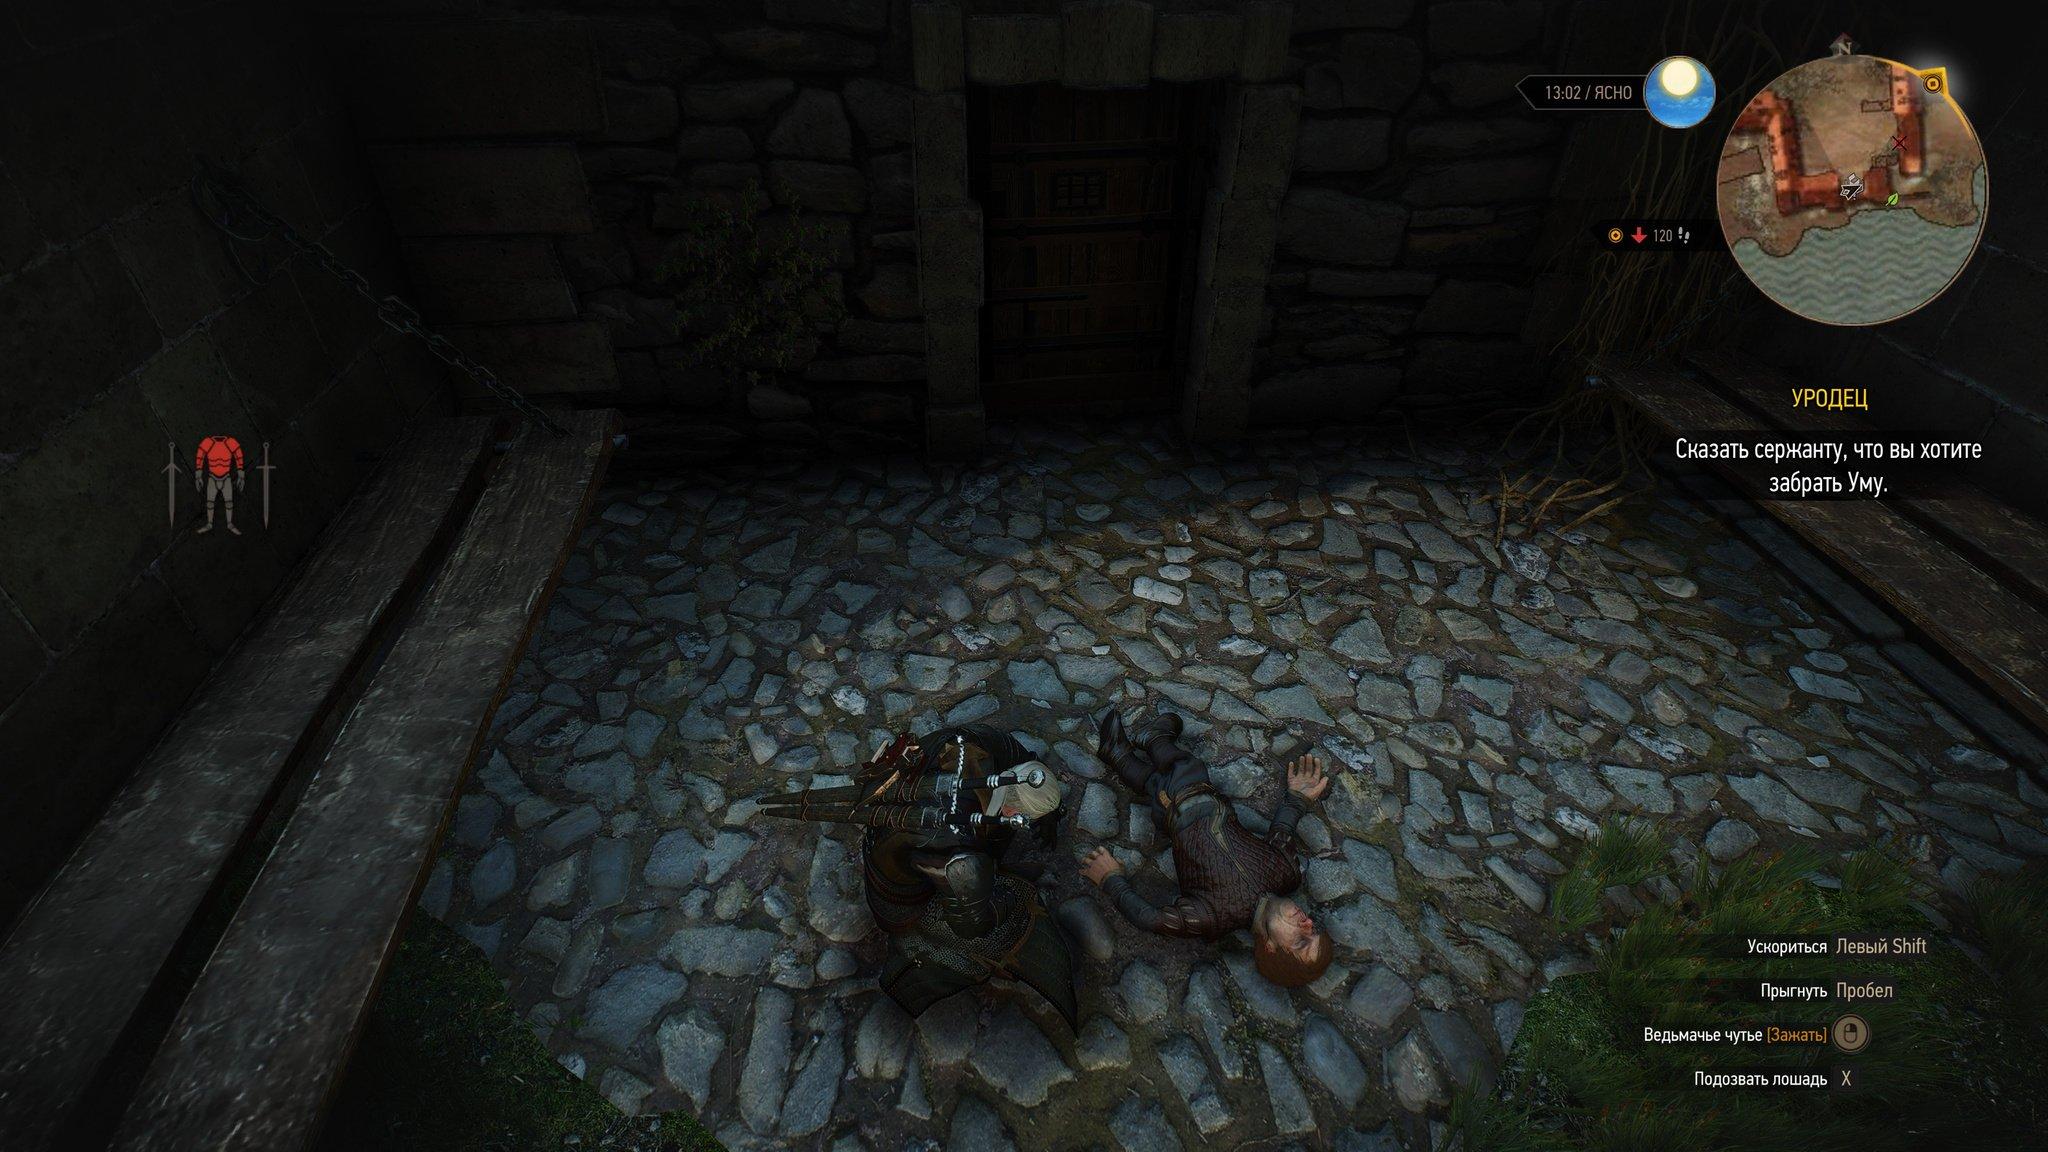 The Witcher 3: Wild Hunt Тирион Ланнистер. - Изображение 1